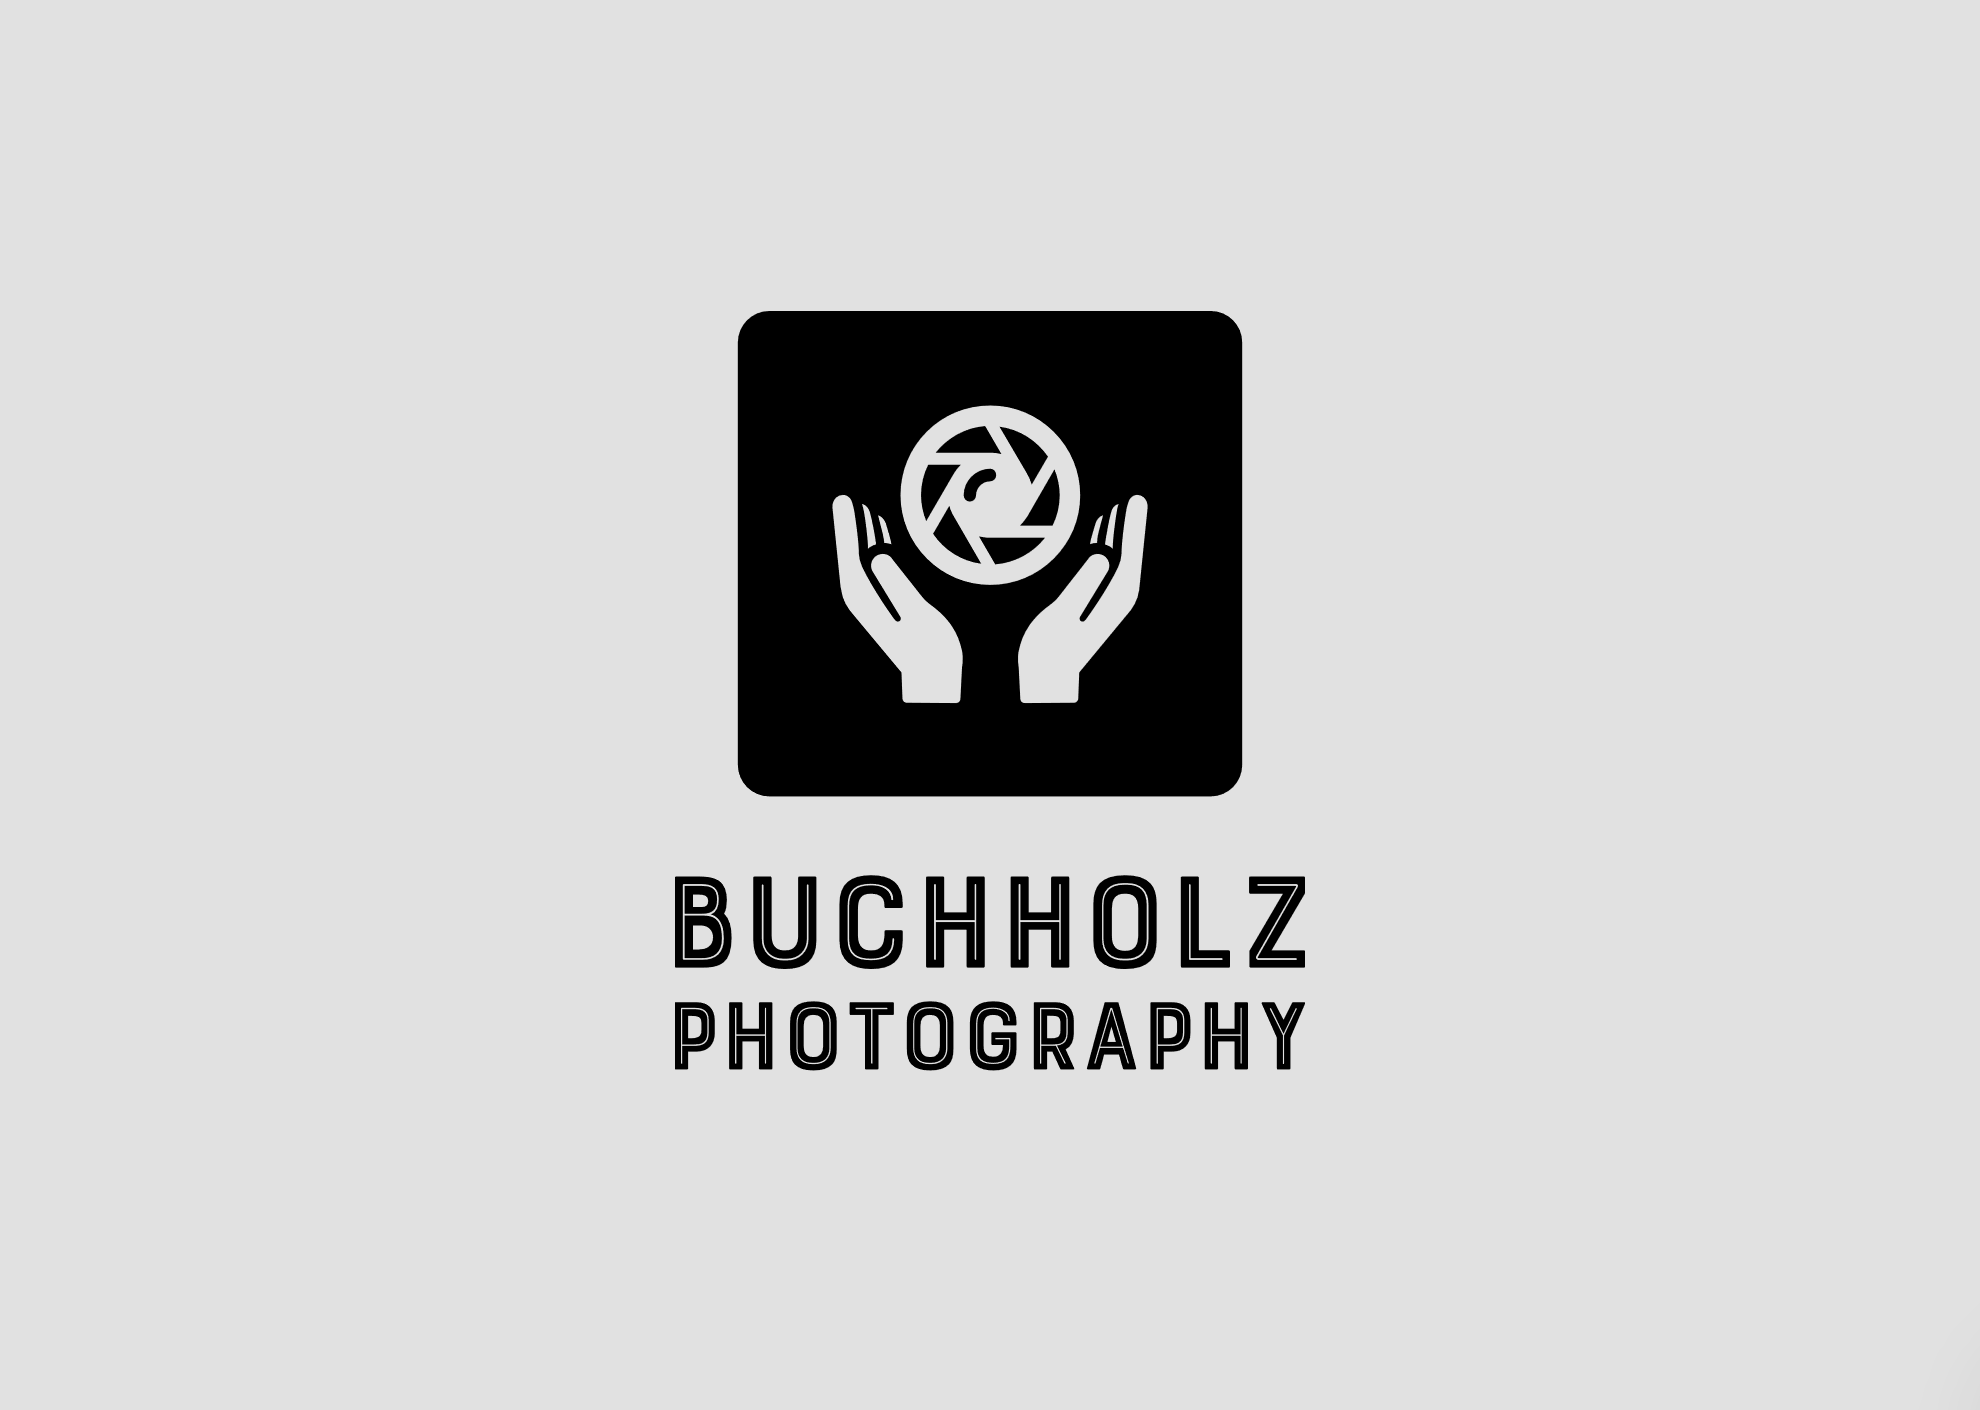 Buchholz Photography